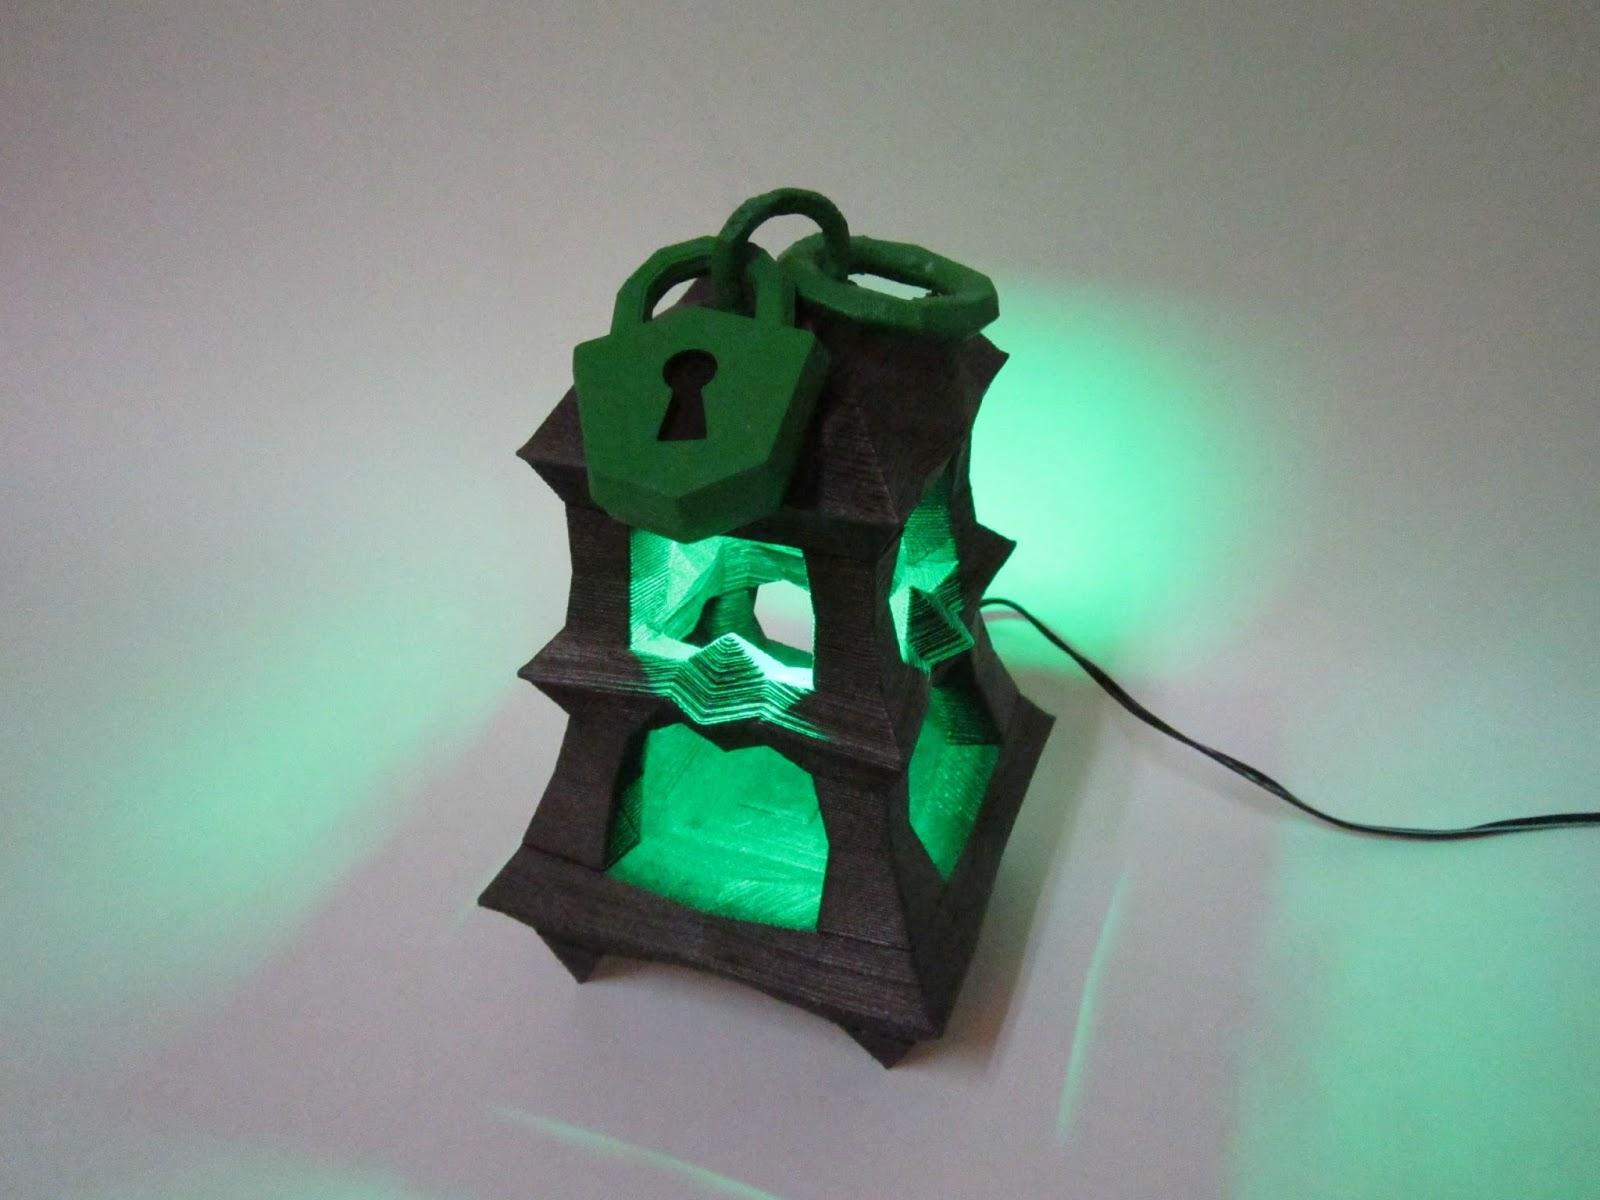 criaram uma lanterna do thresh